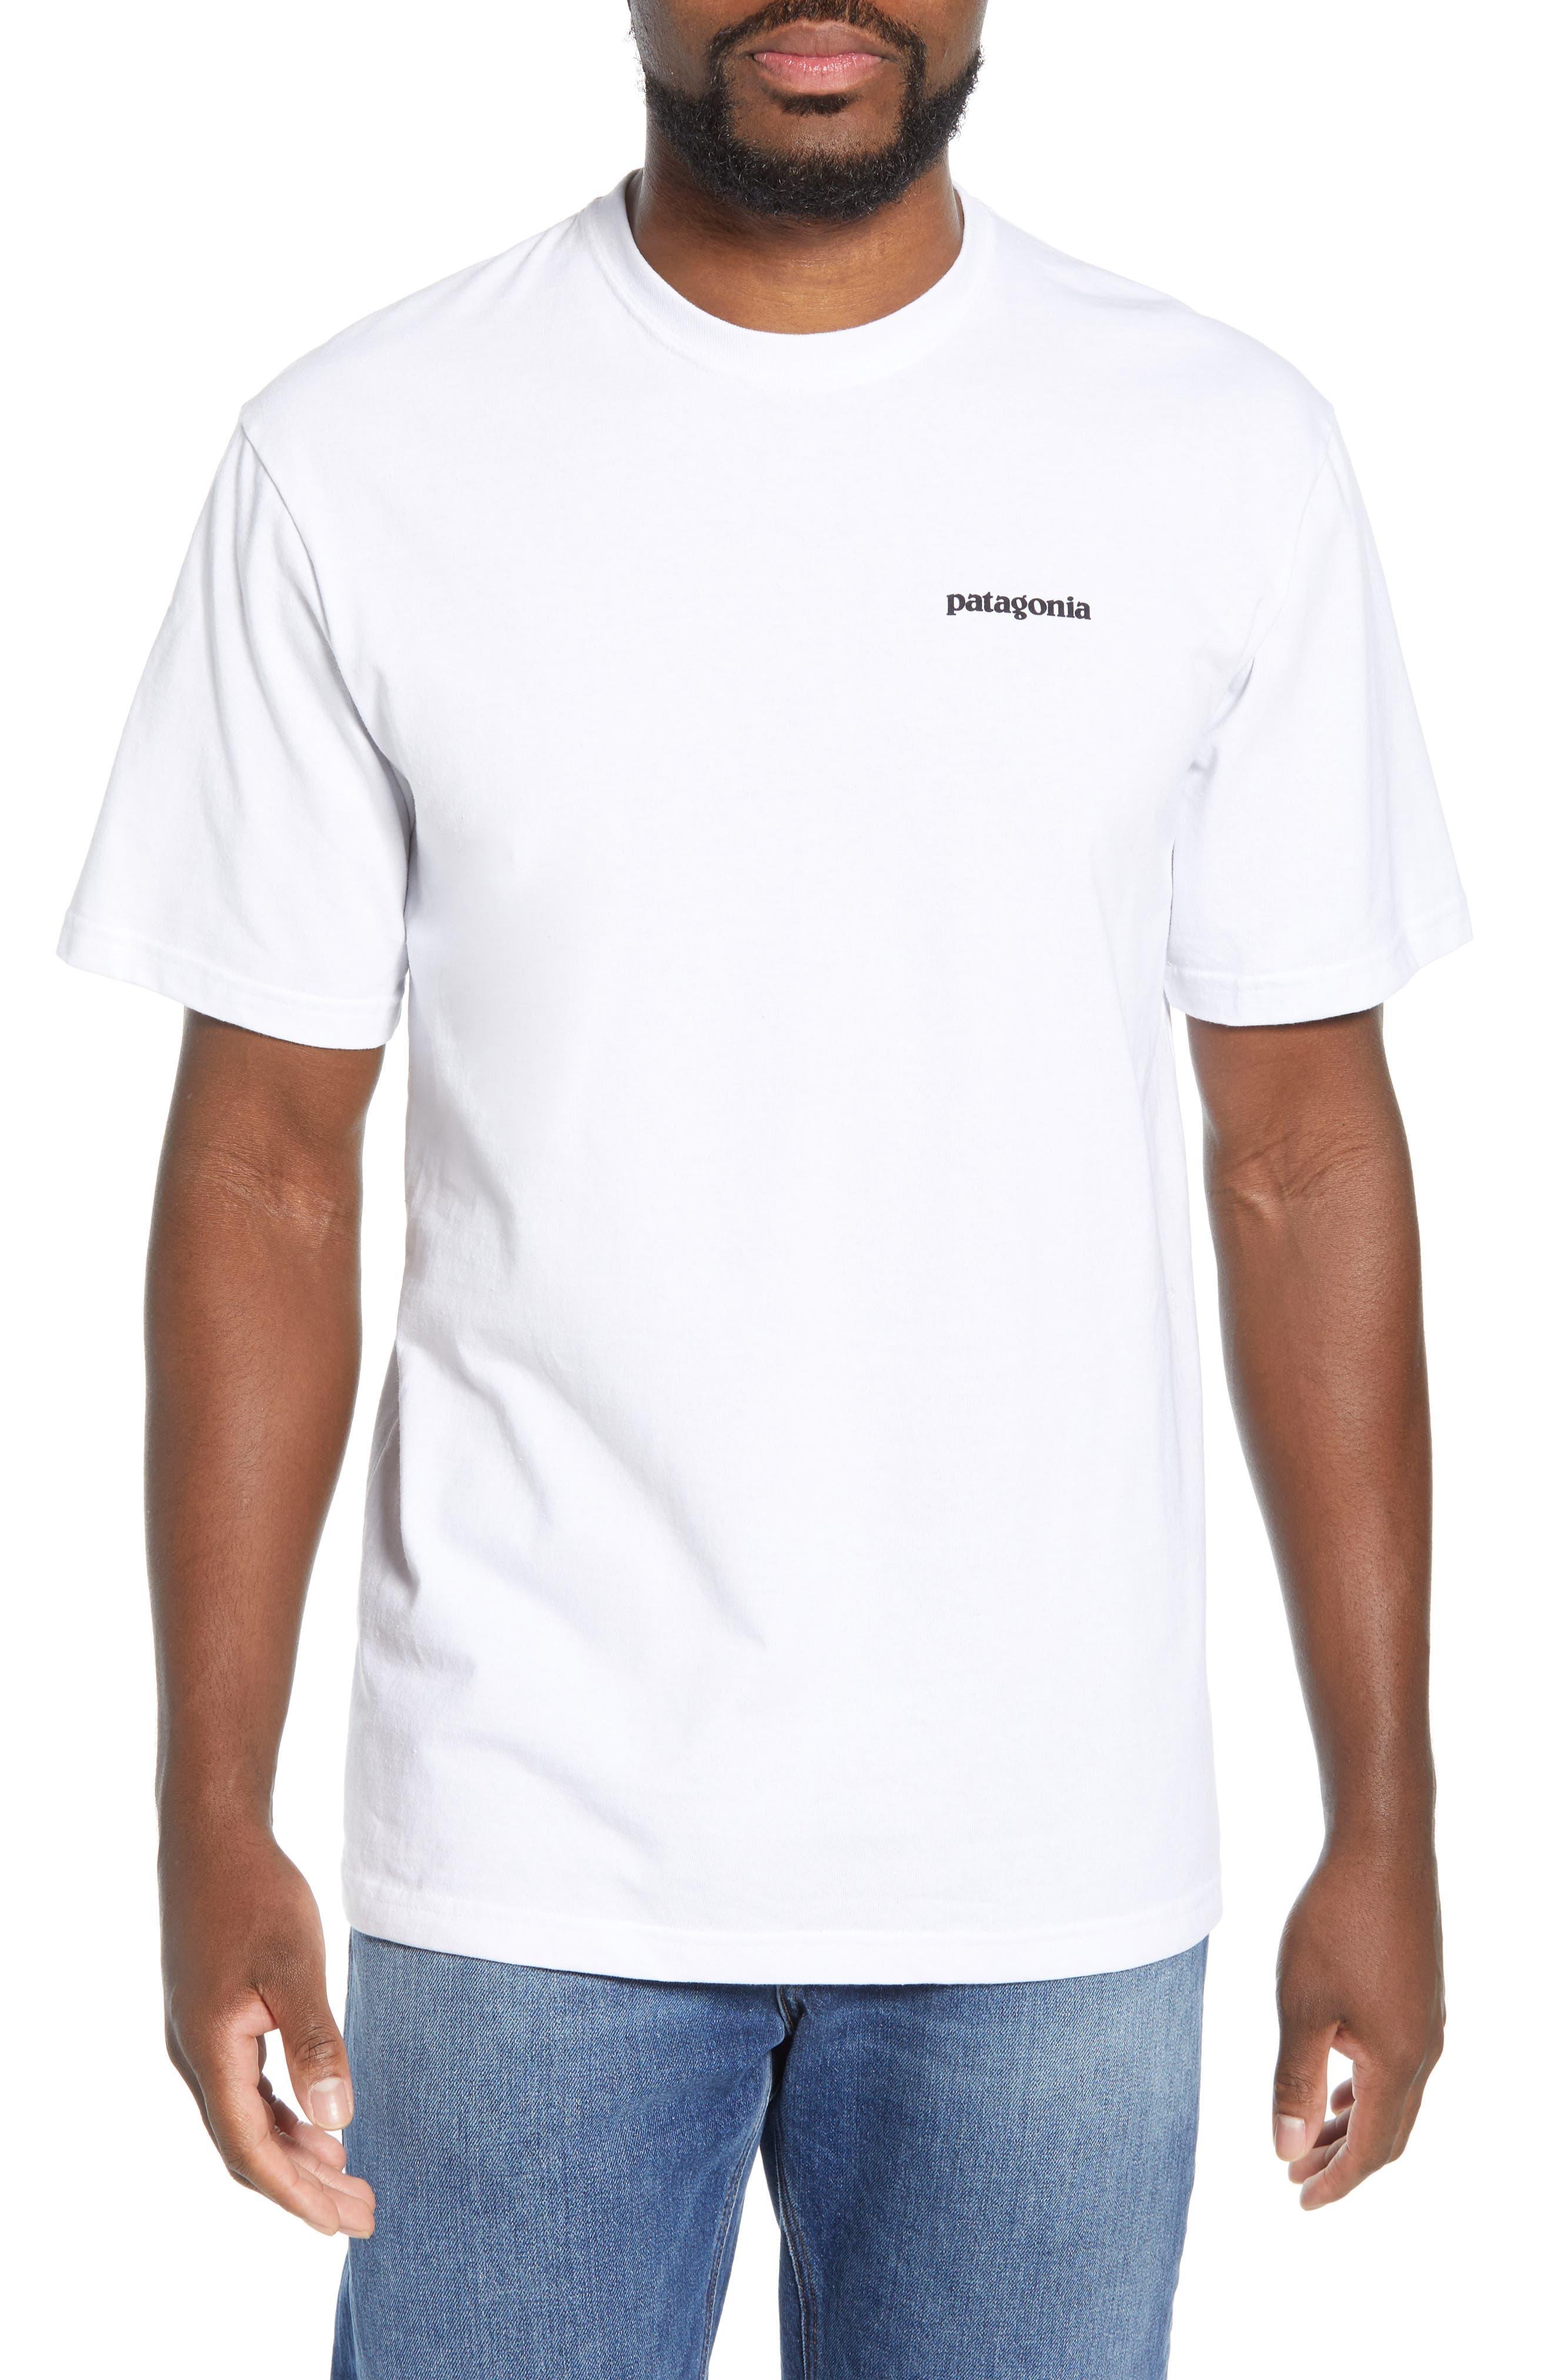 Patagonia Fitz Roy Bison Responsibili-Tee T-Shirt, White